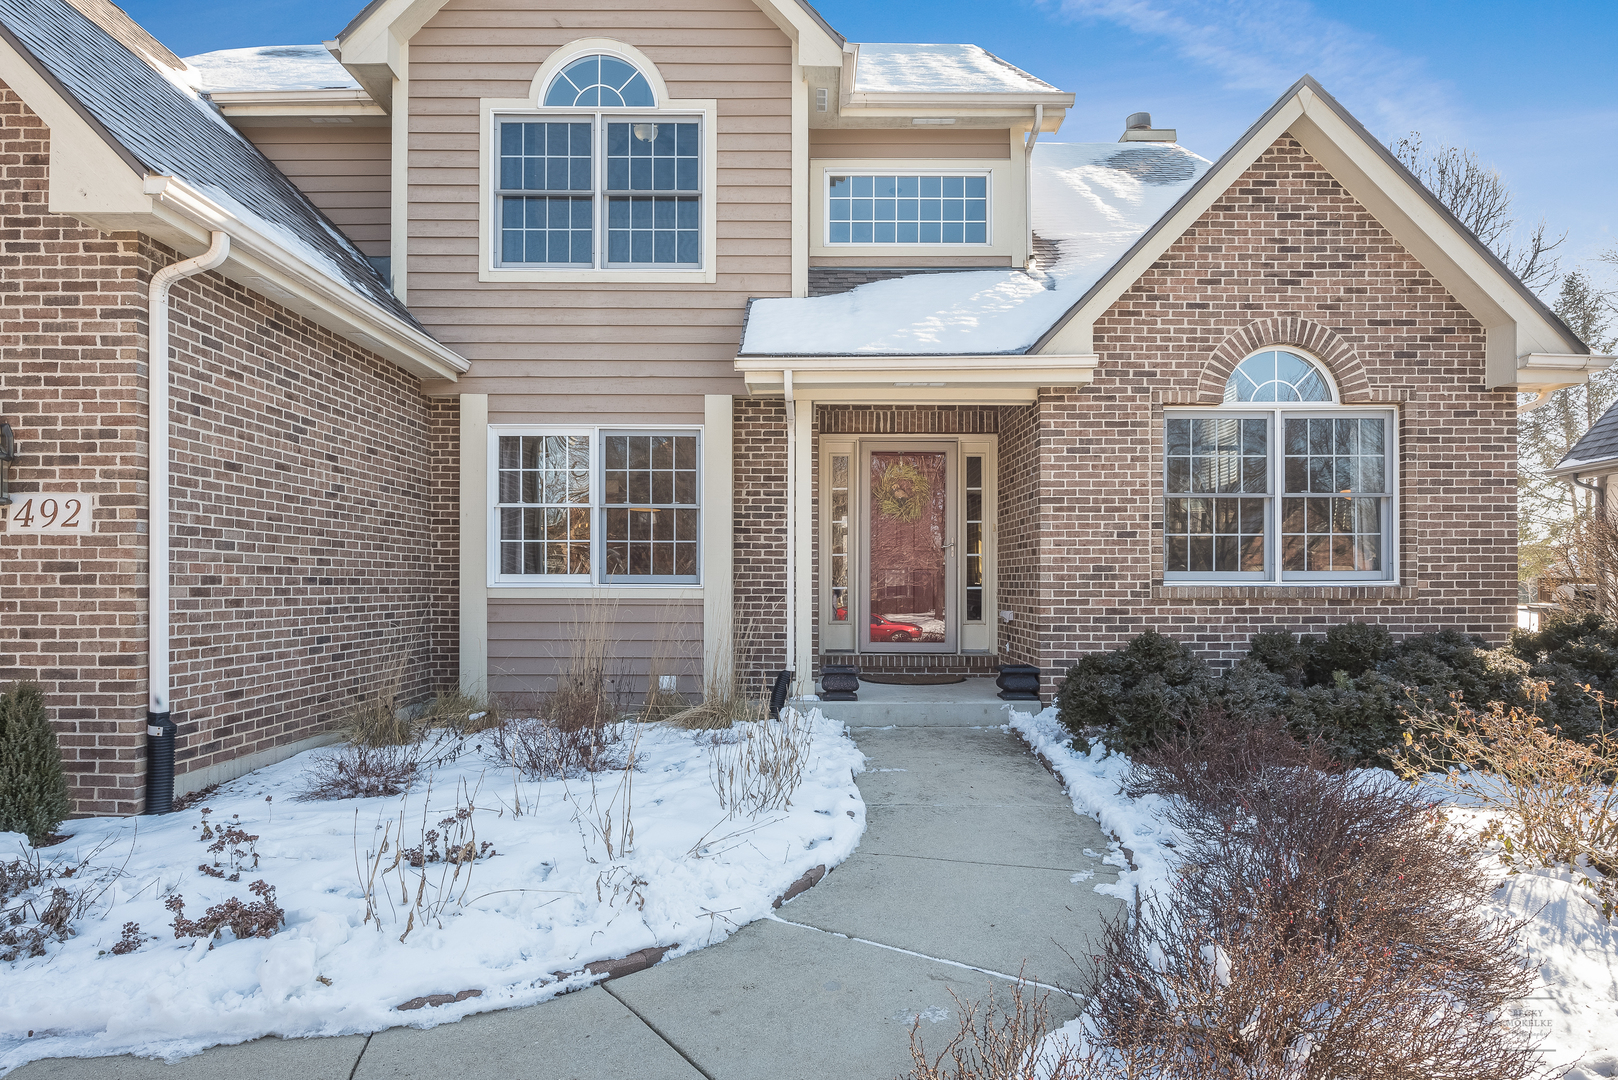 492 Waubonsee, Oswego, Illinois, 60543